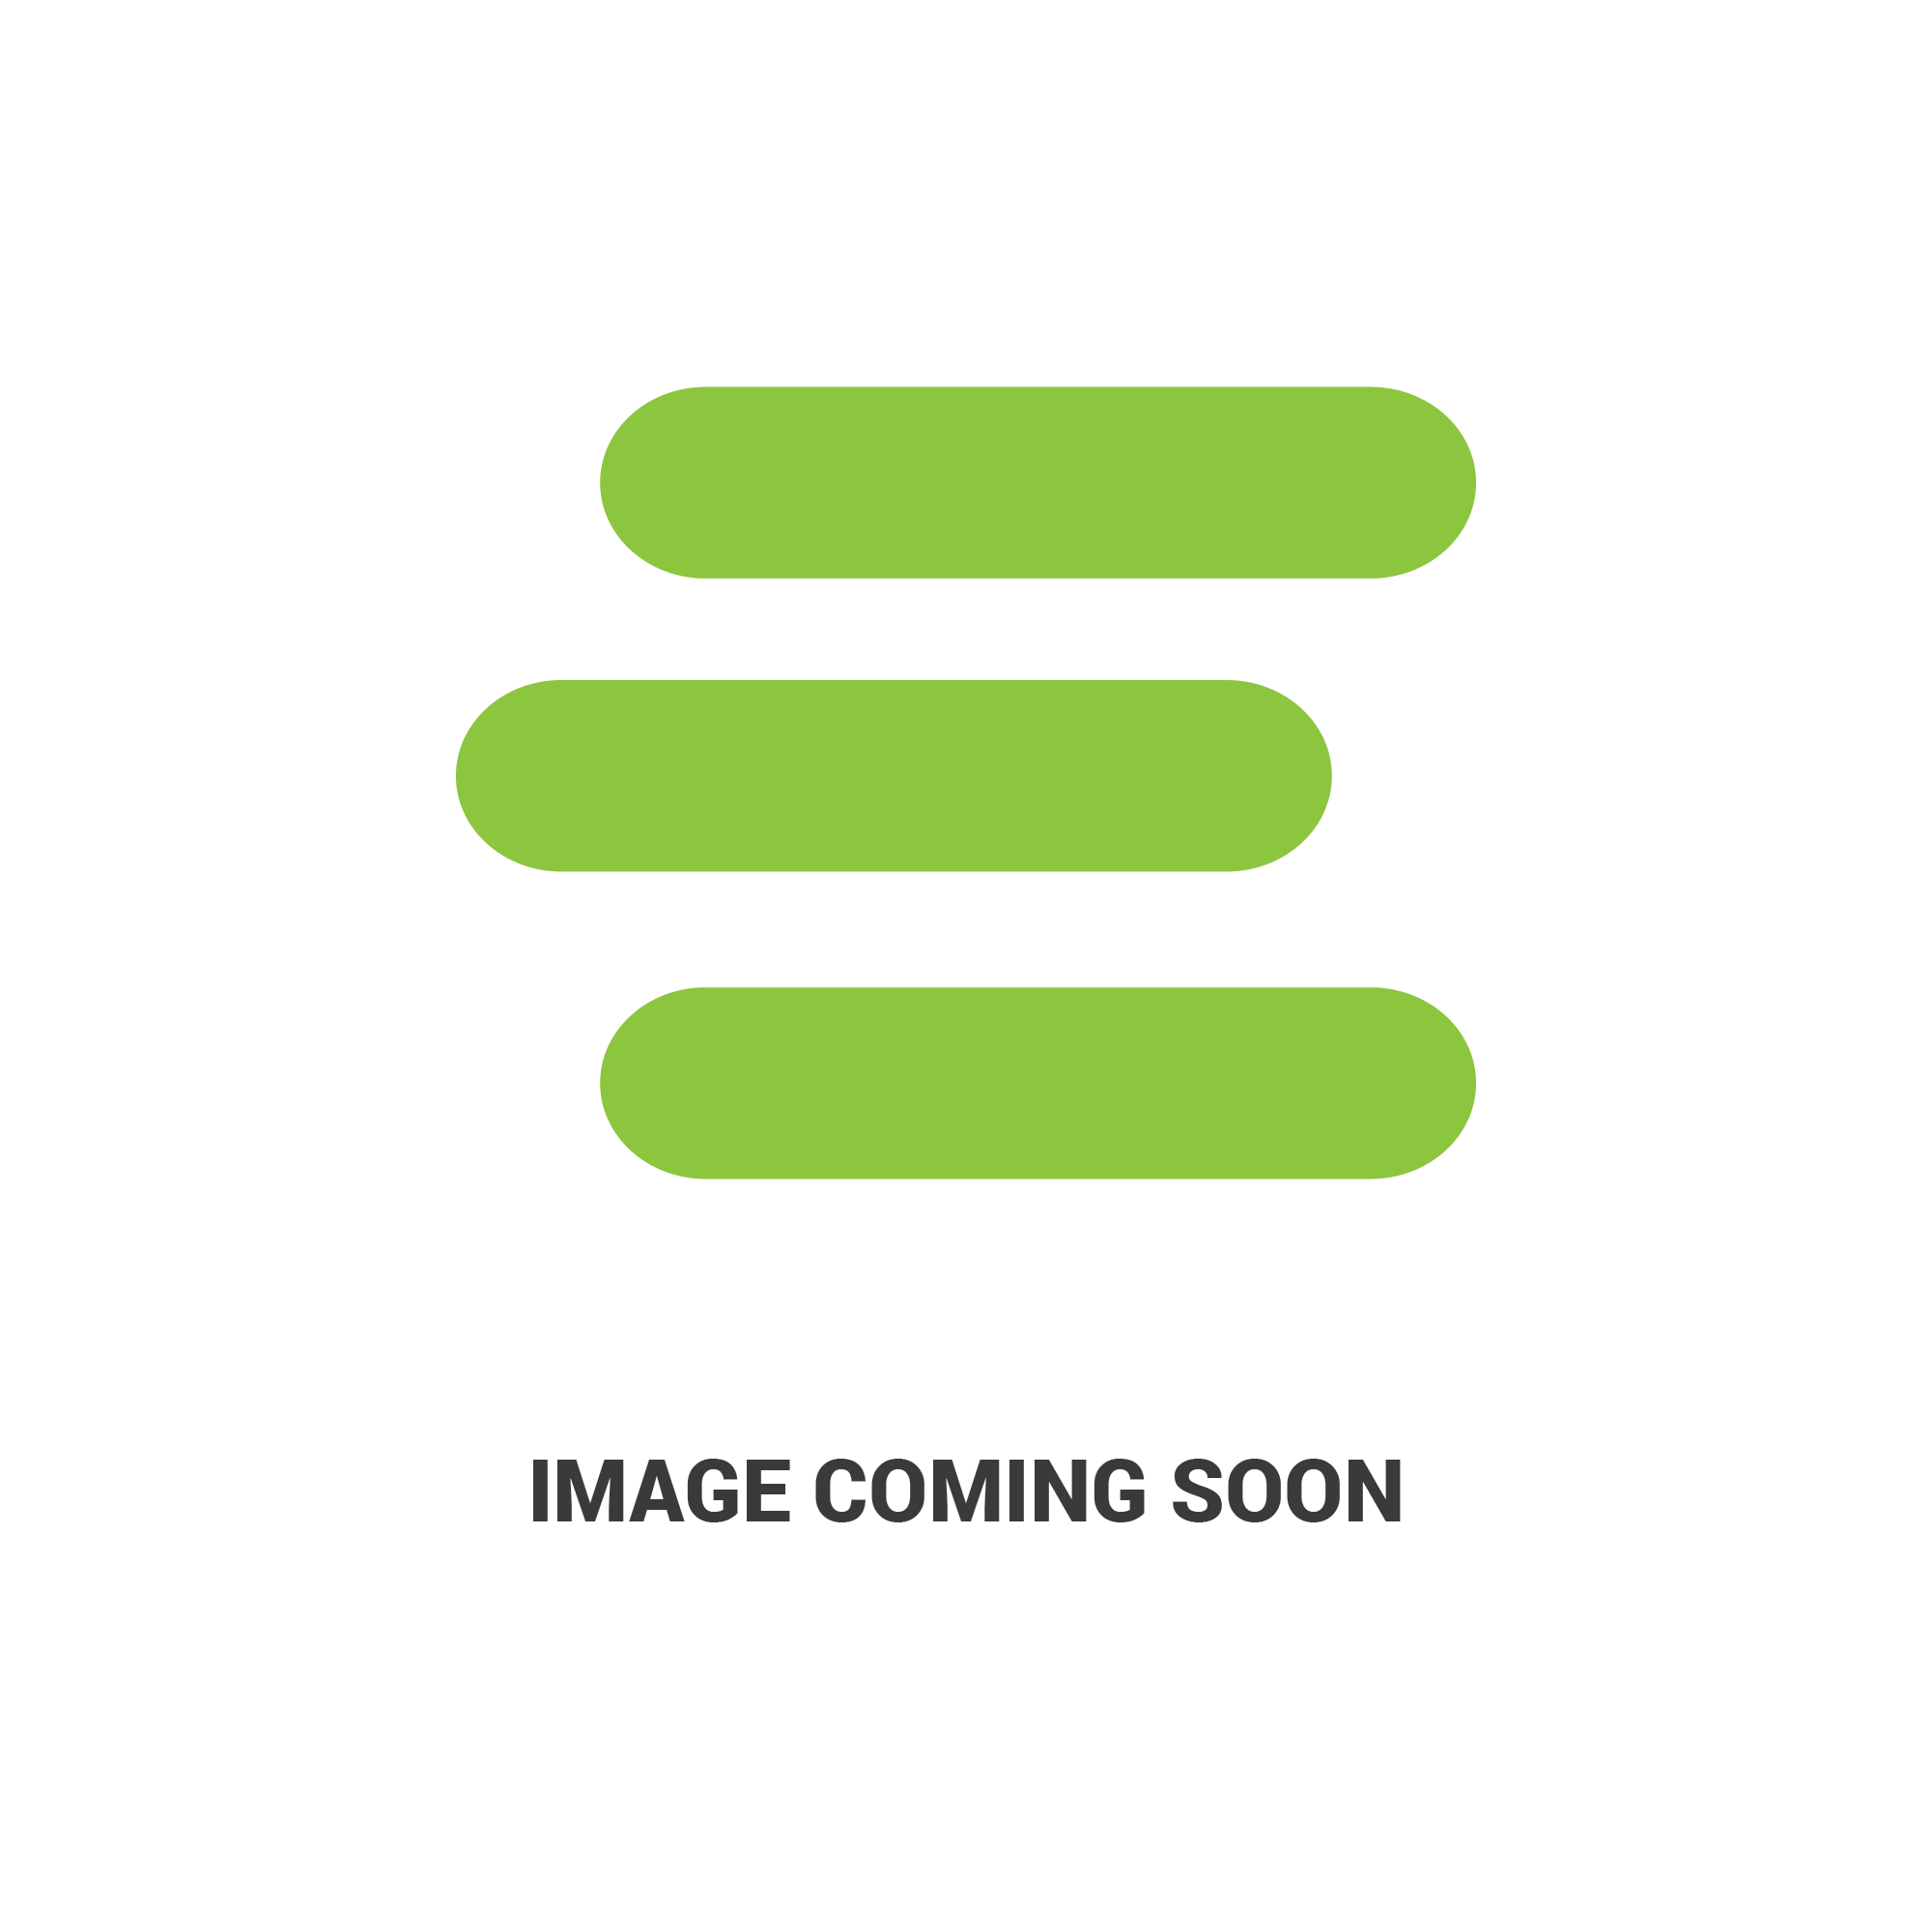 E-9380403edit 1.jpg